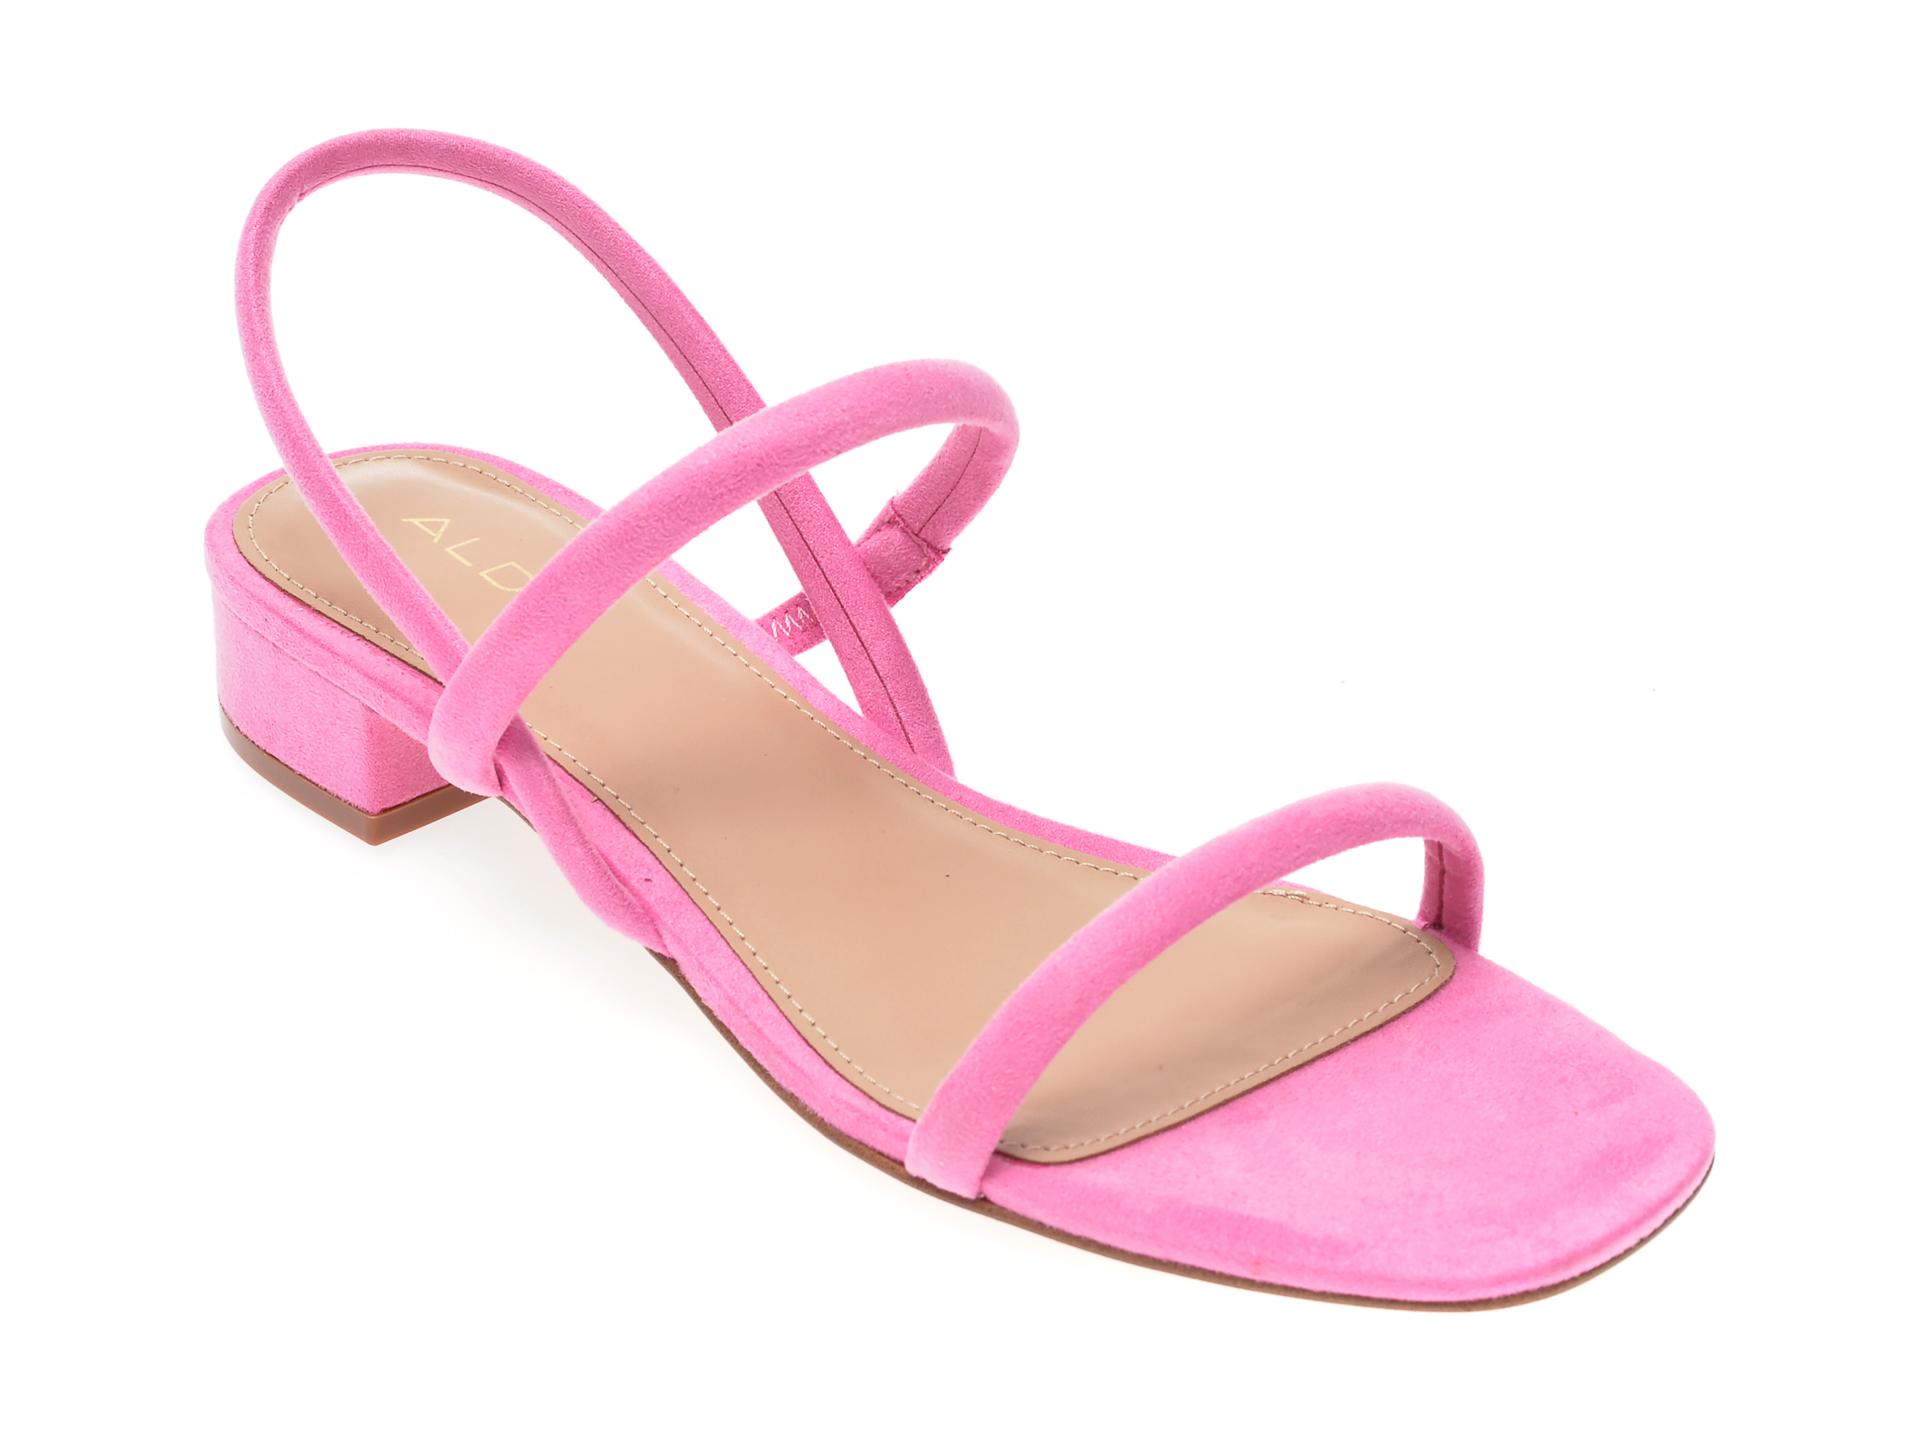 Sandale ALDO roz, Candidly670, din material textil New